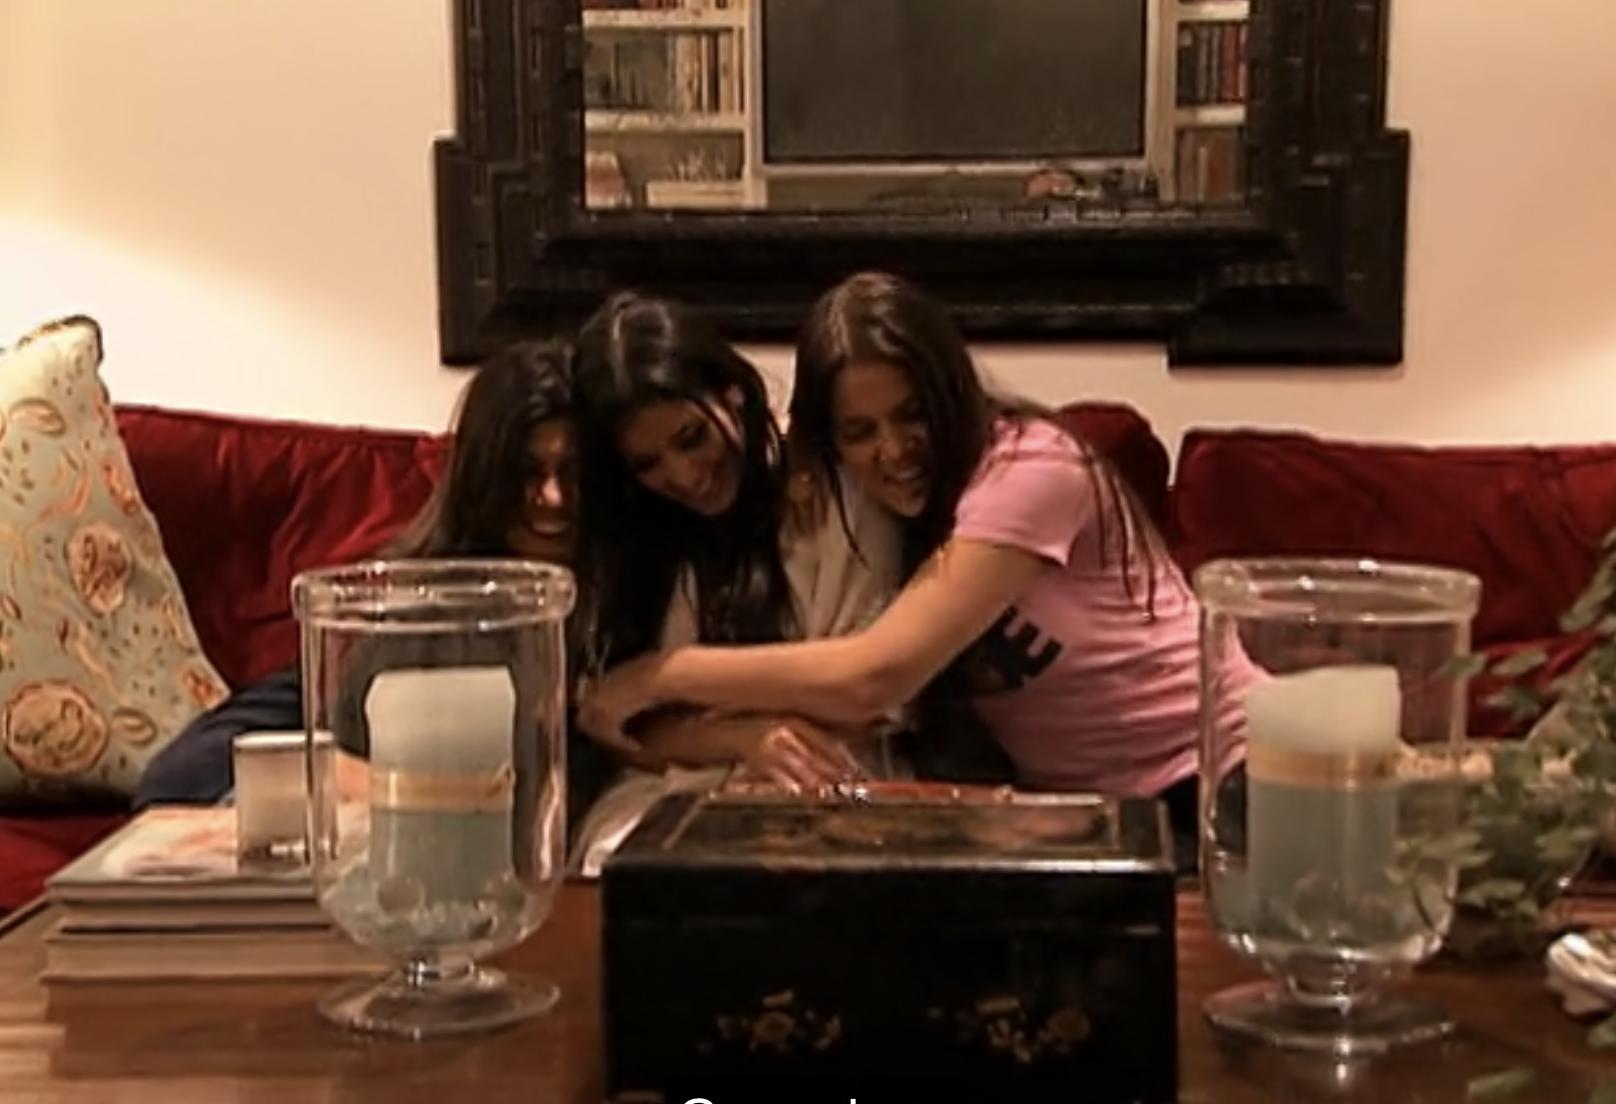 Khloe, Kim, Kourt hugging